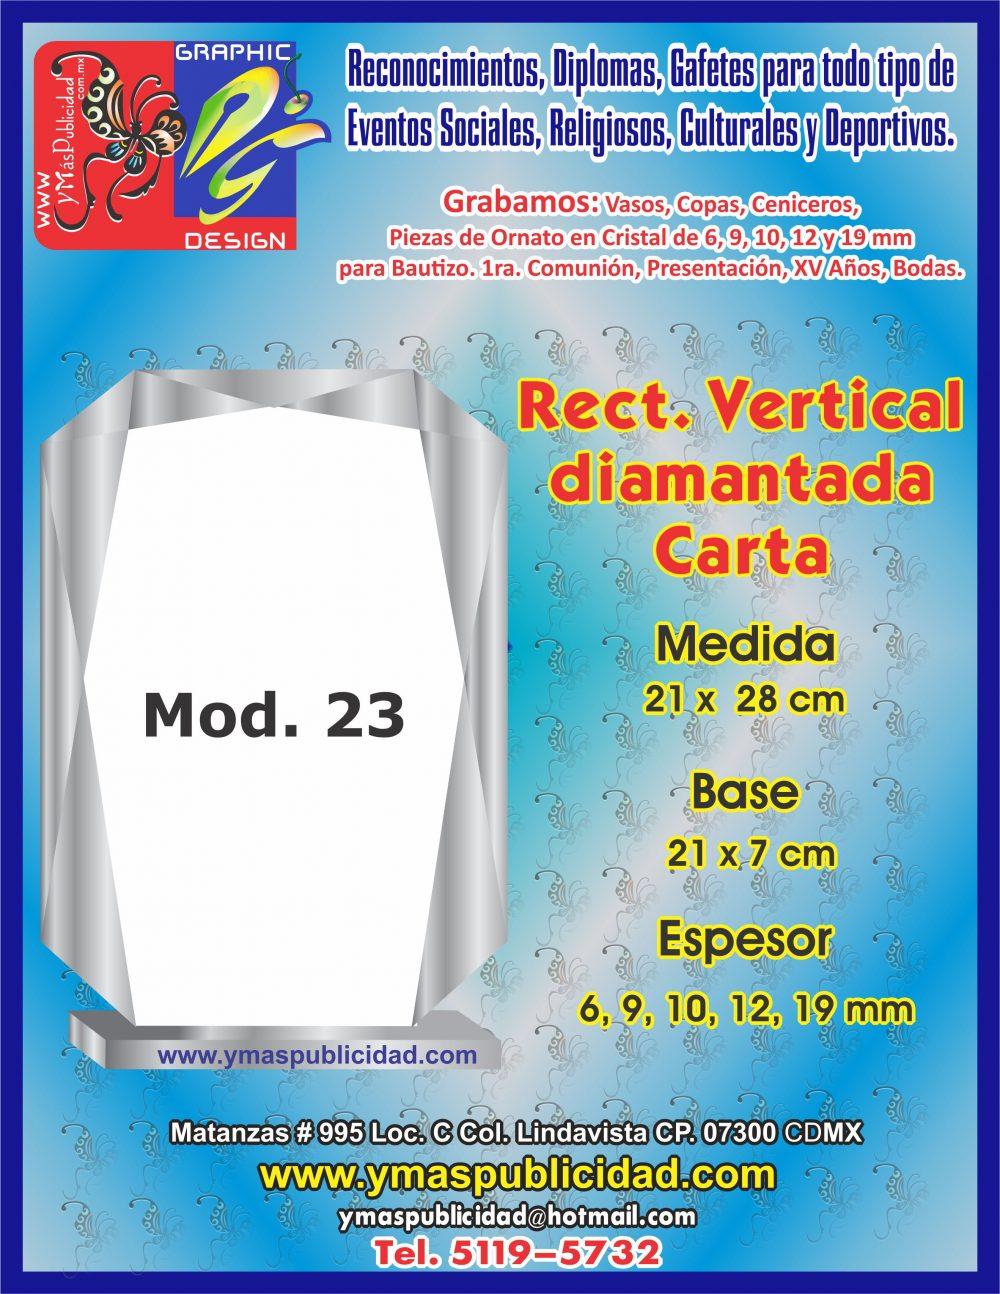 RECT. VERTICAL DIAMANTADA CARTA